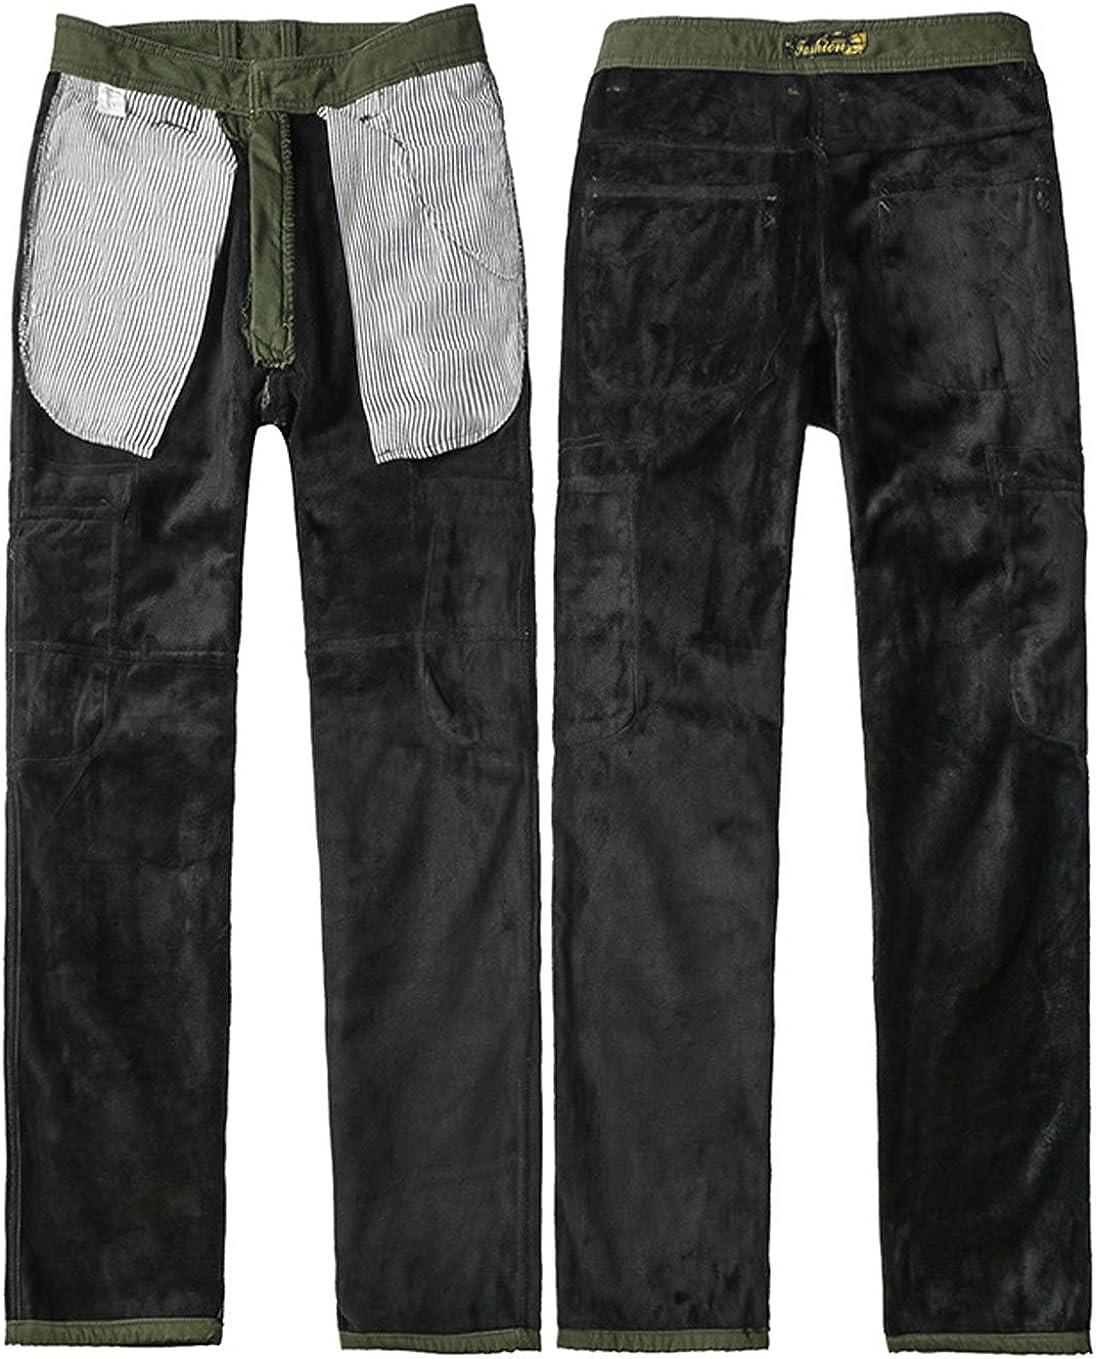 chouyatou Mens Outdoor Sports Multi Pockets Dungaree Fleece Lined Cargo Work Pants